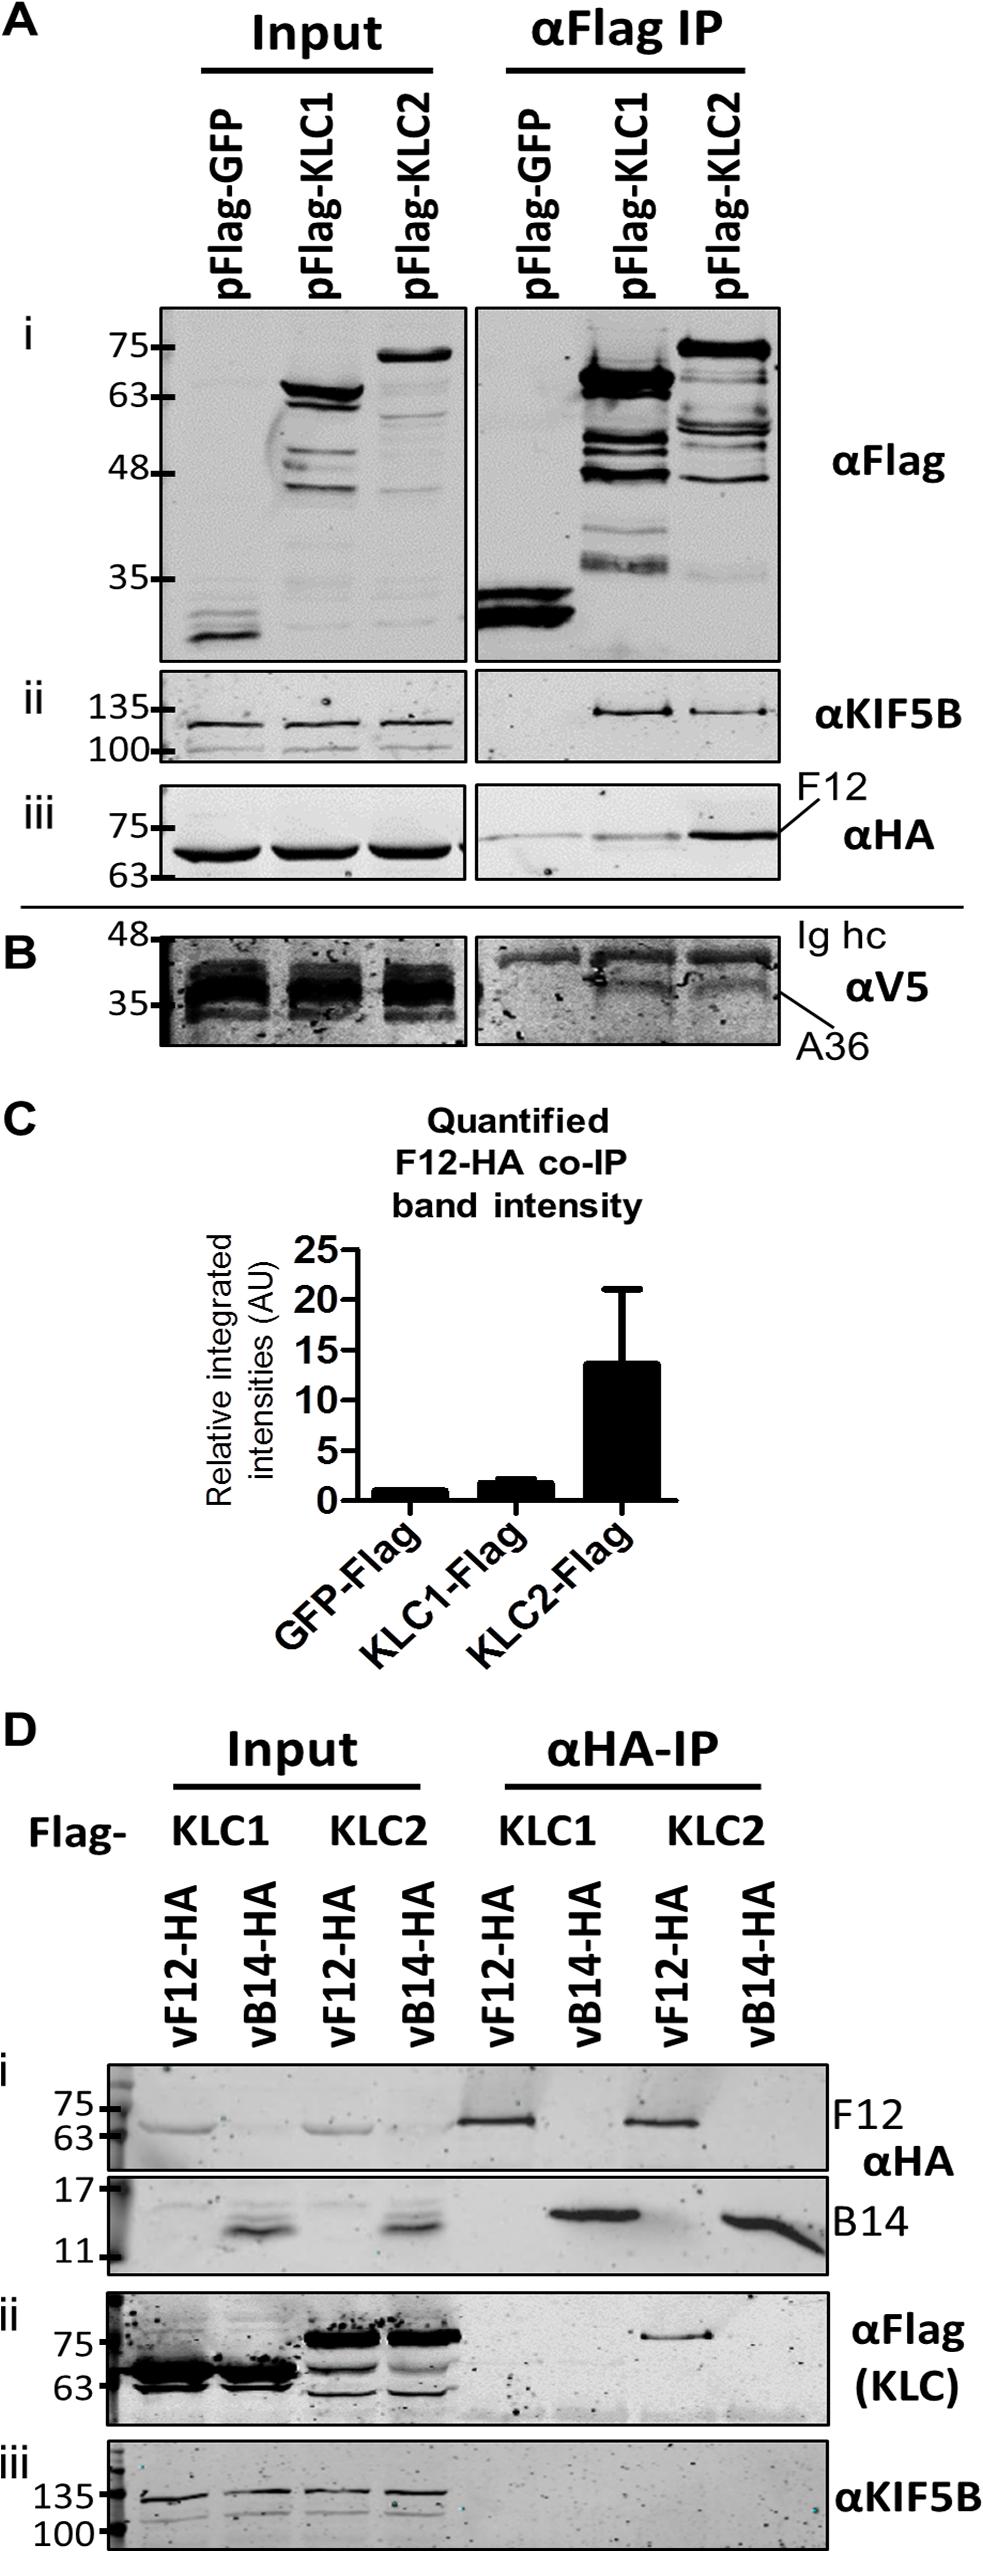 F12 co-immunoprecipitates with kinesin light chain isoform 2.